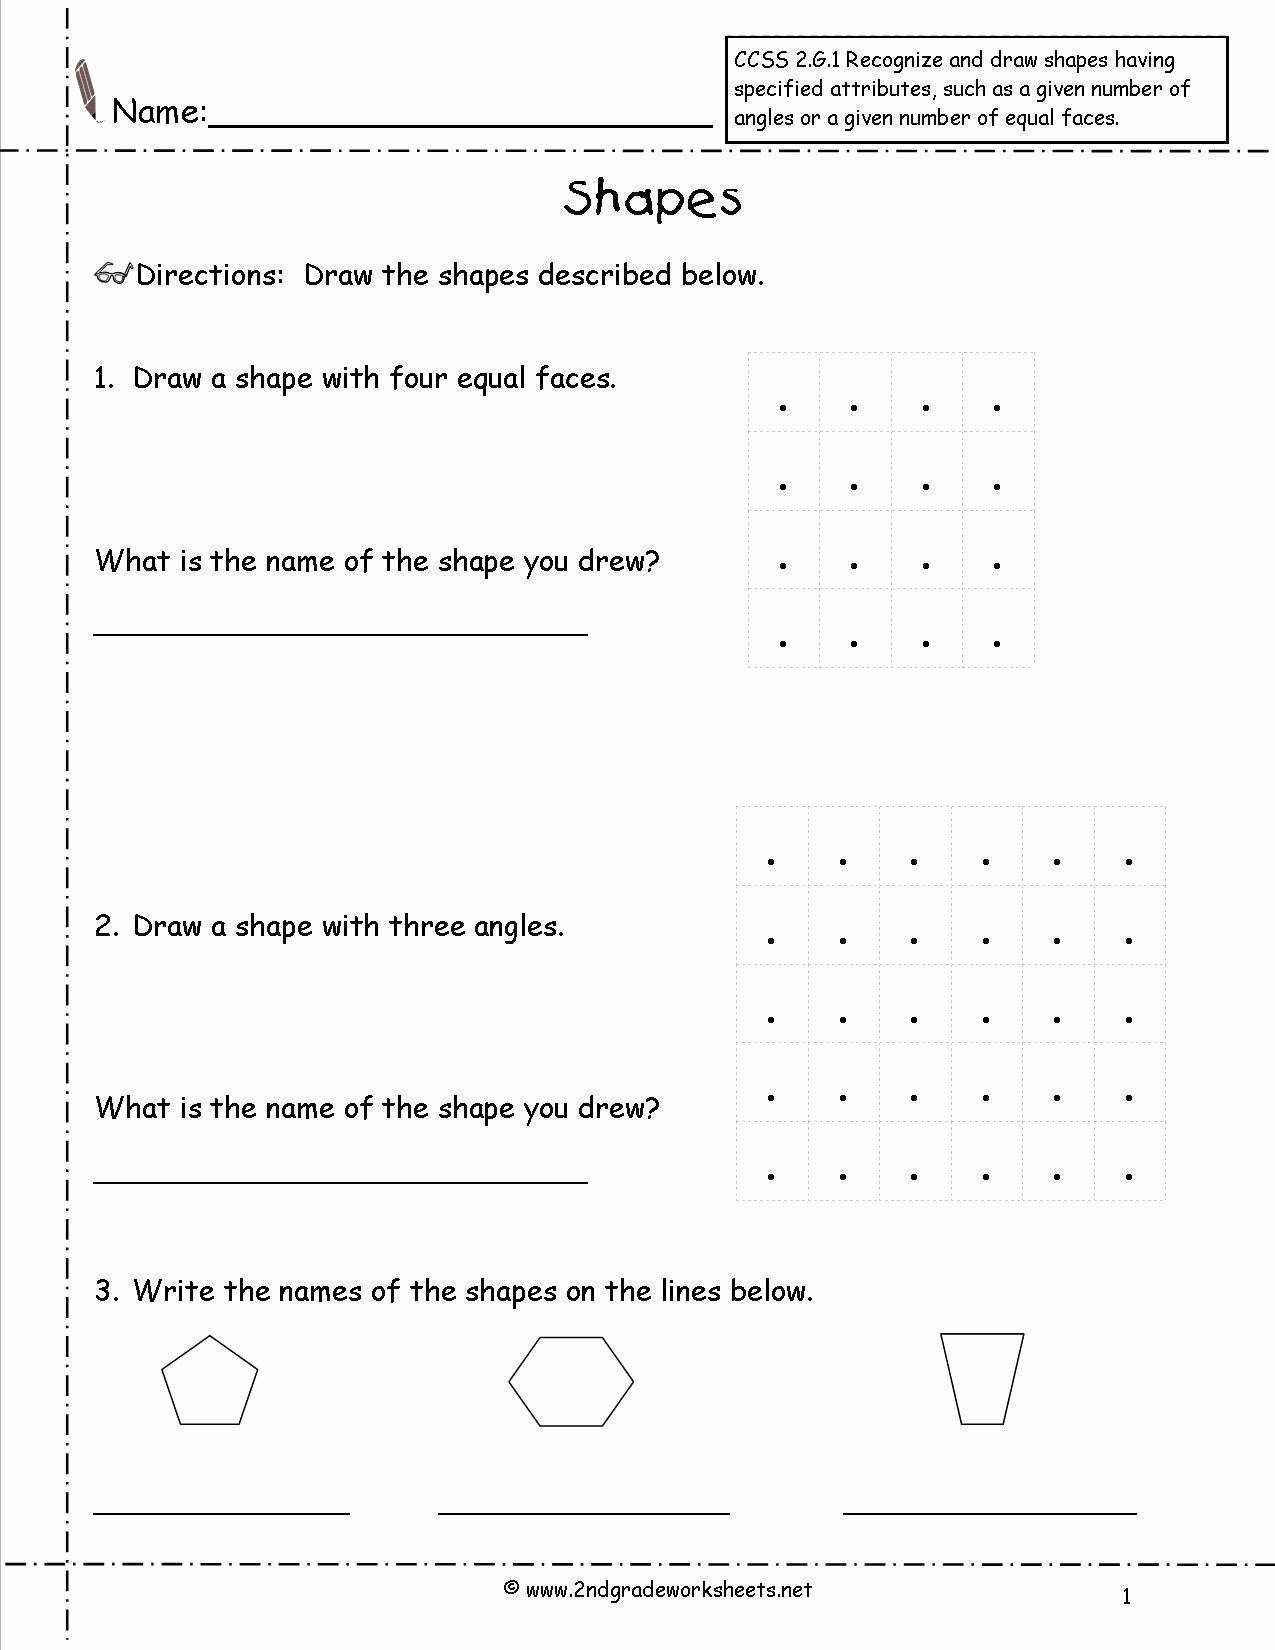 Beginning Algebra Worksheets